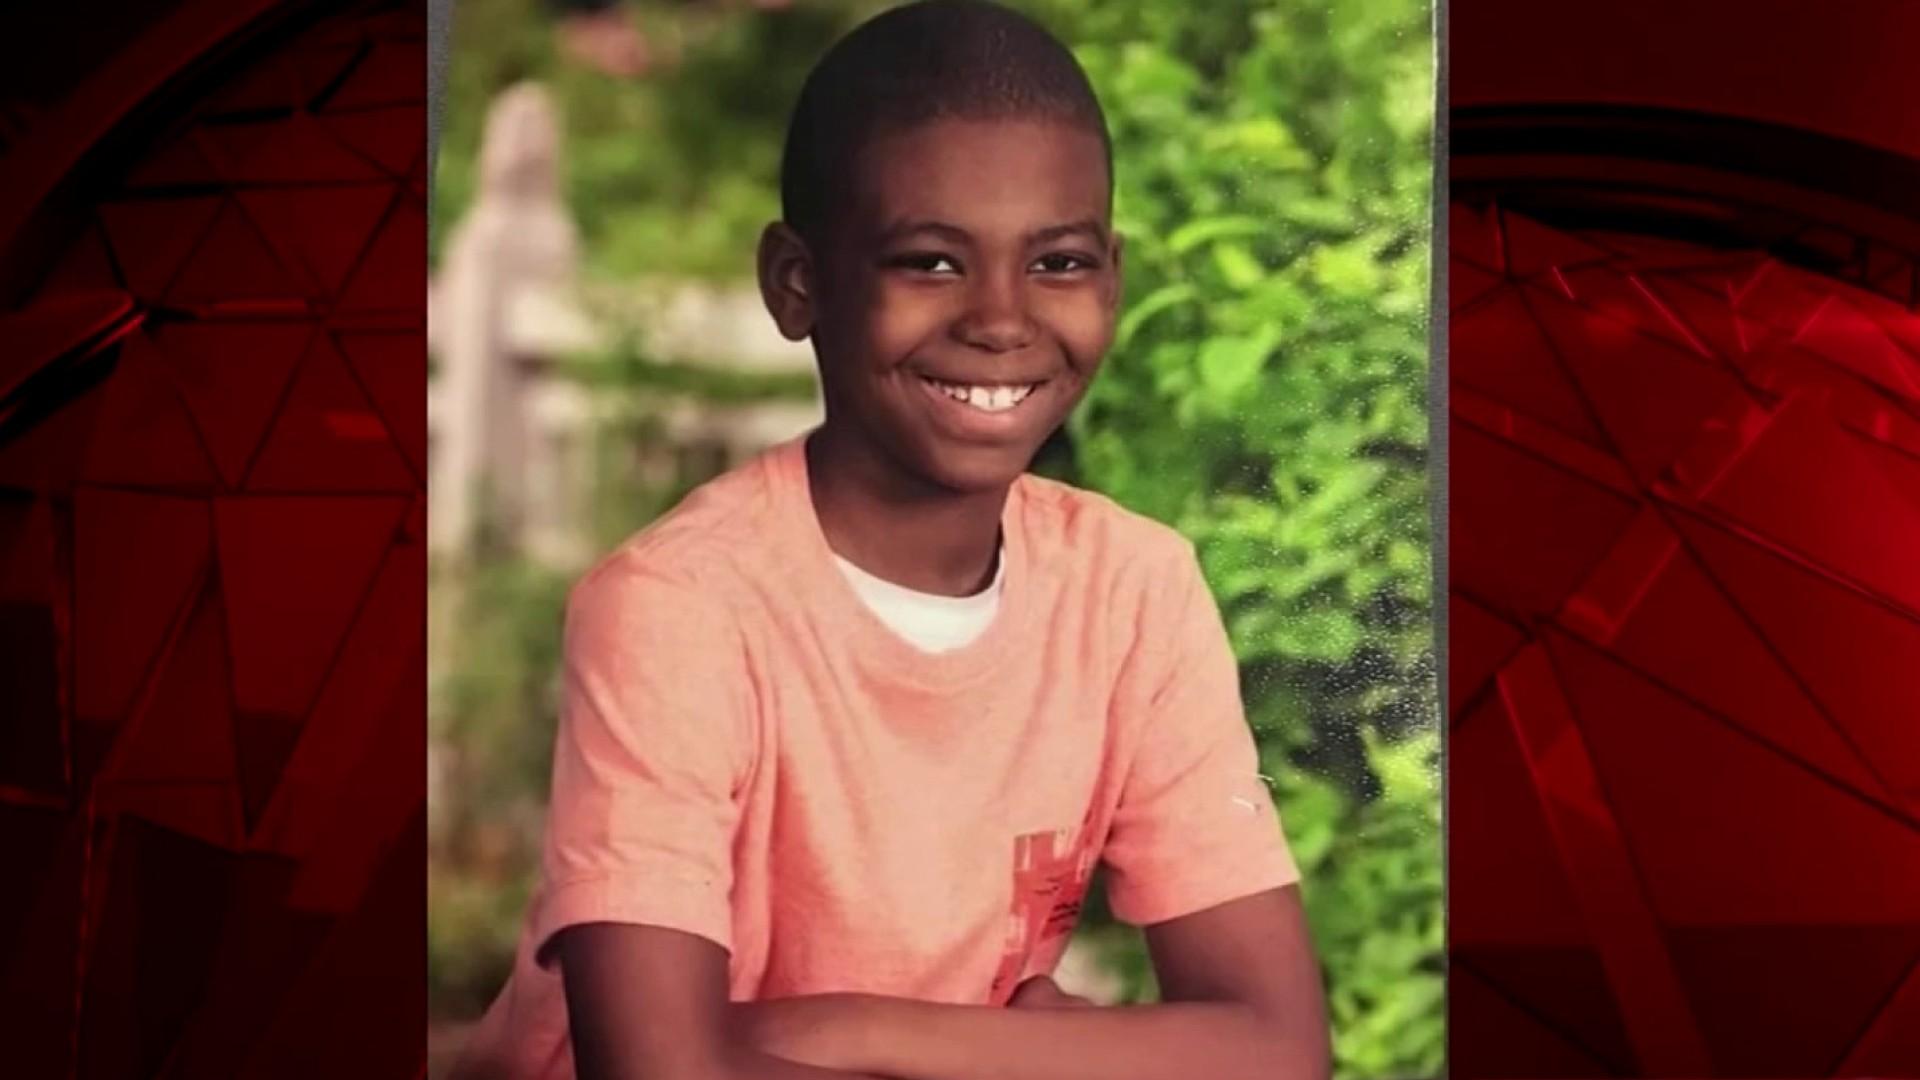 Search Underway for Missing NJ Boy Last Seen Riding Bike